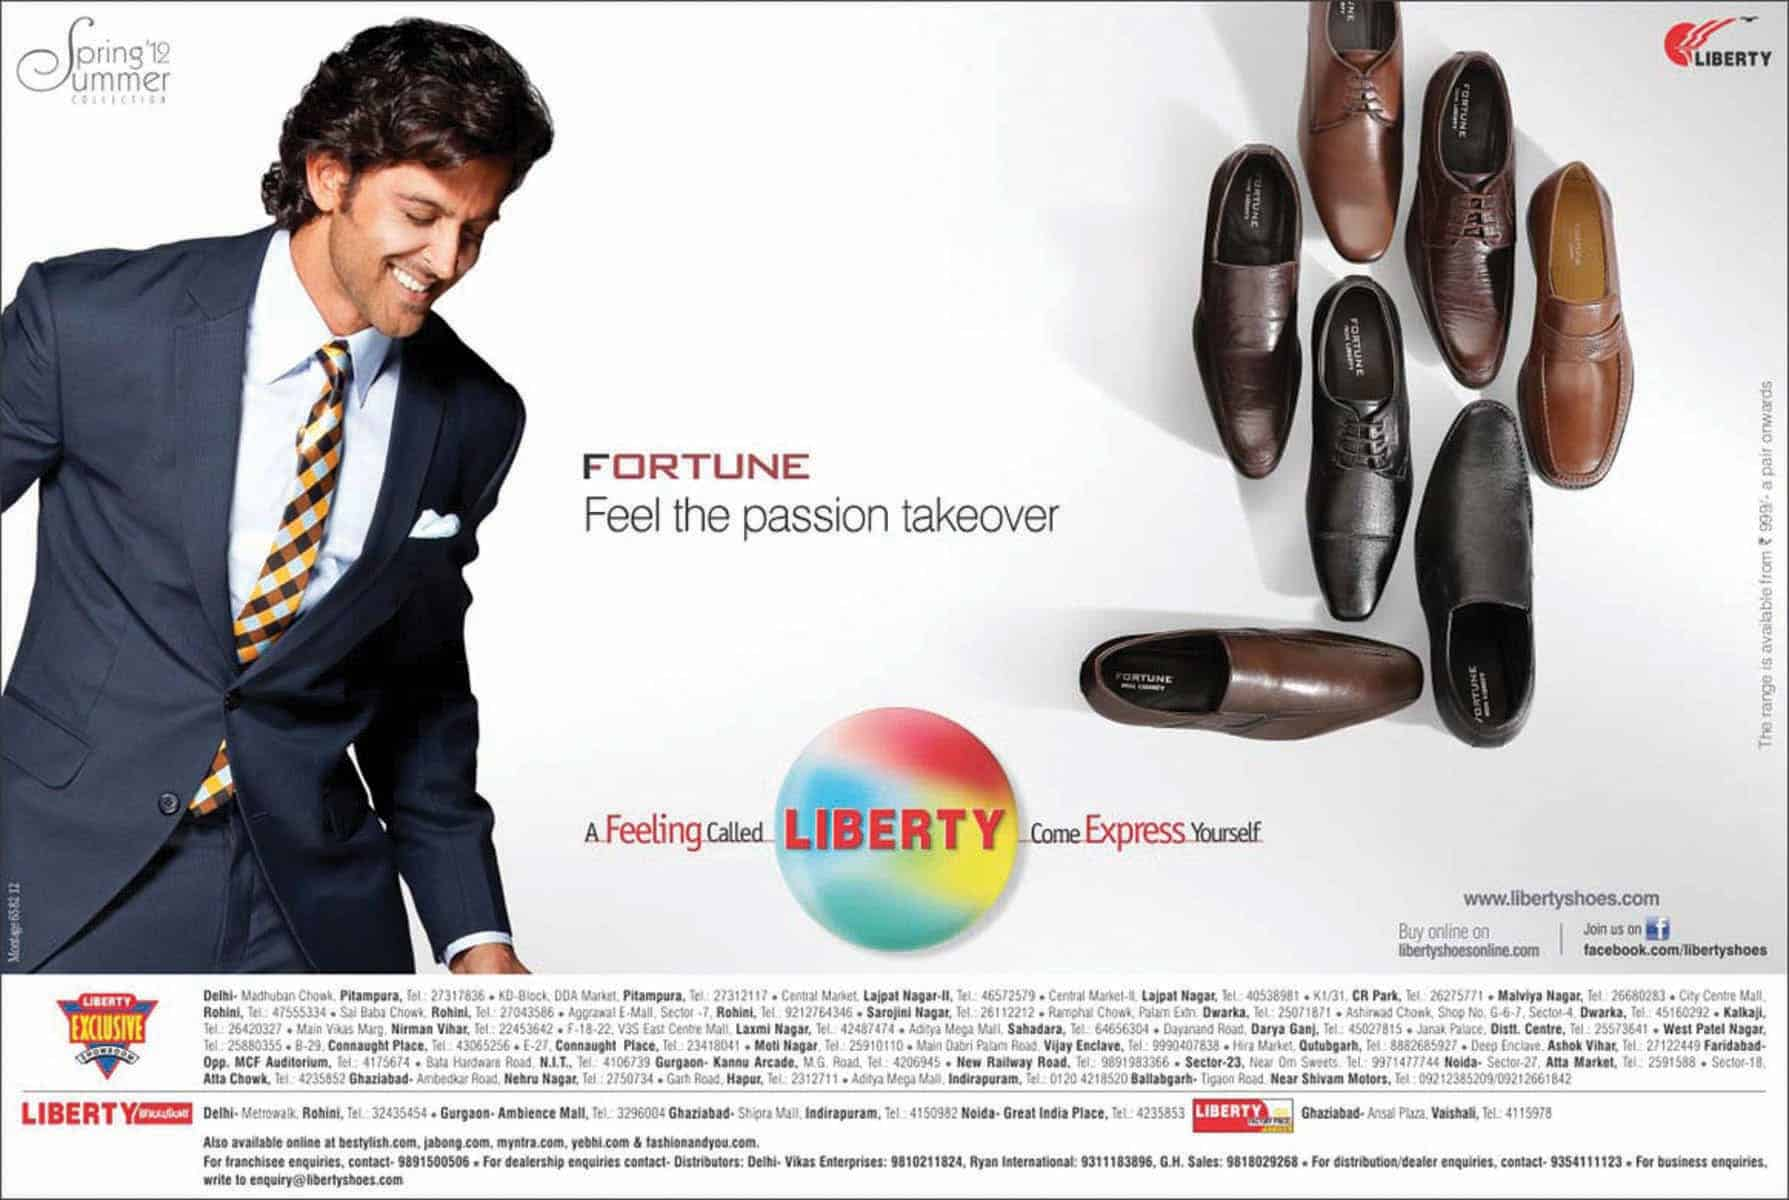 liberty shoes advertisement